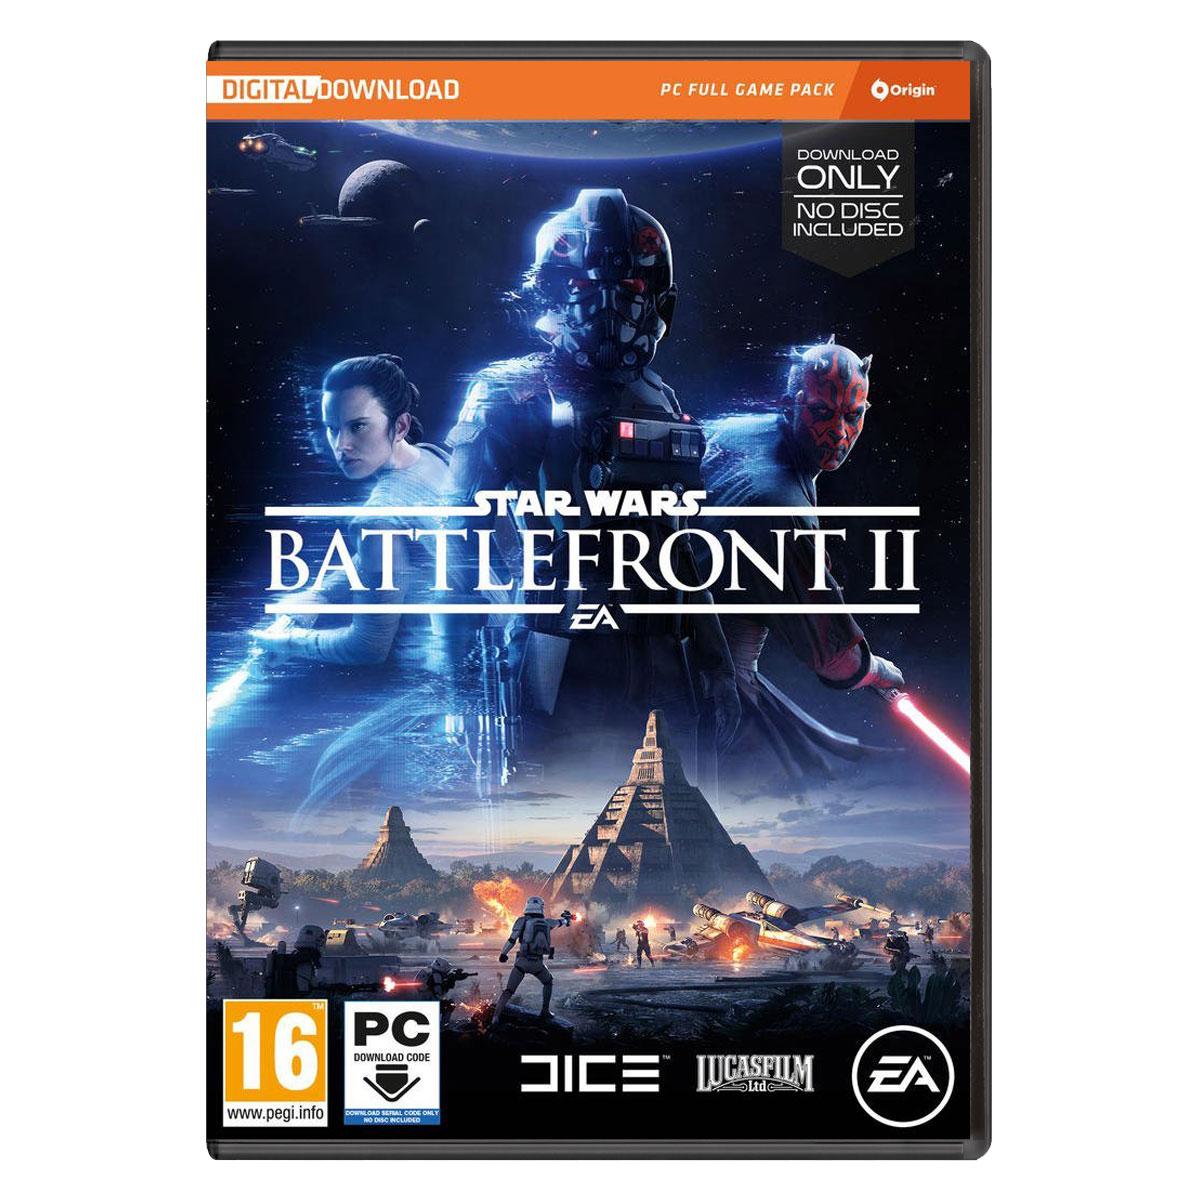 Jeux PC Star Wars : Battlefront II (PC) Star Wars : Battlefront II (PC)